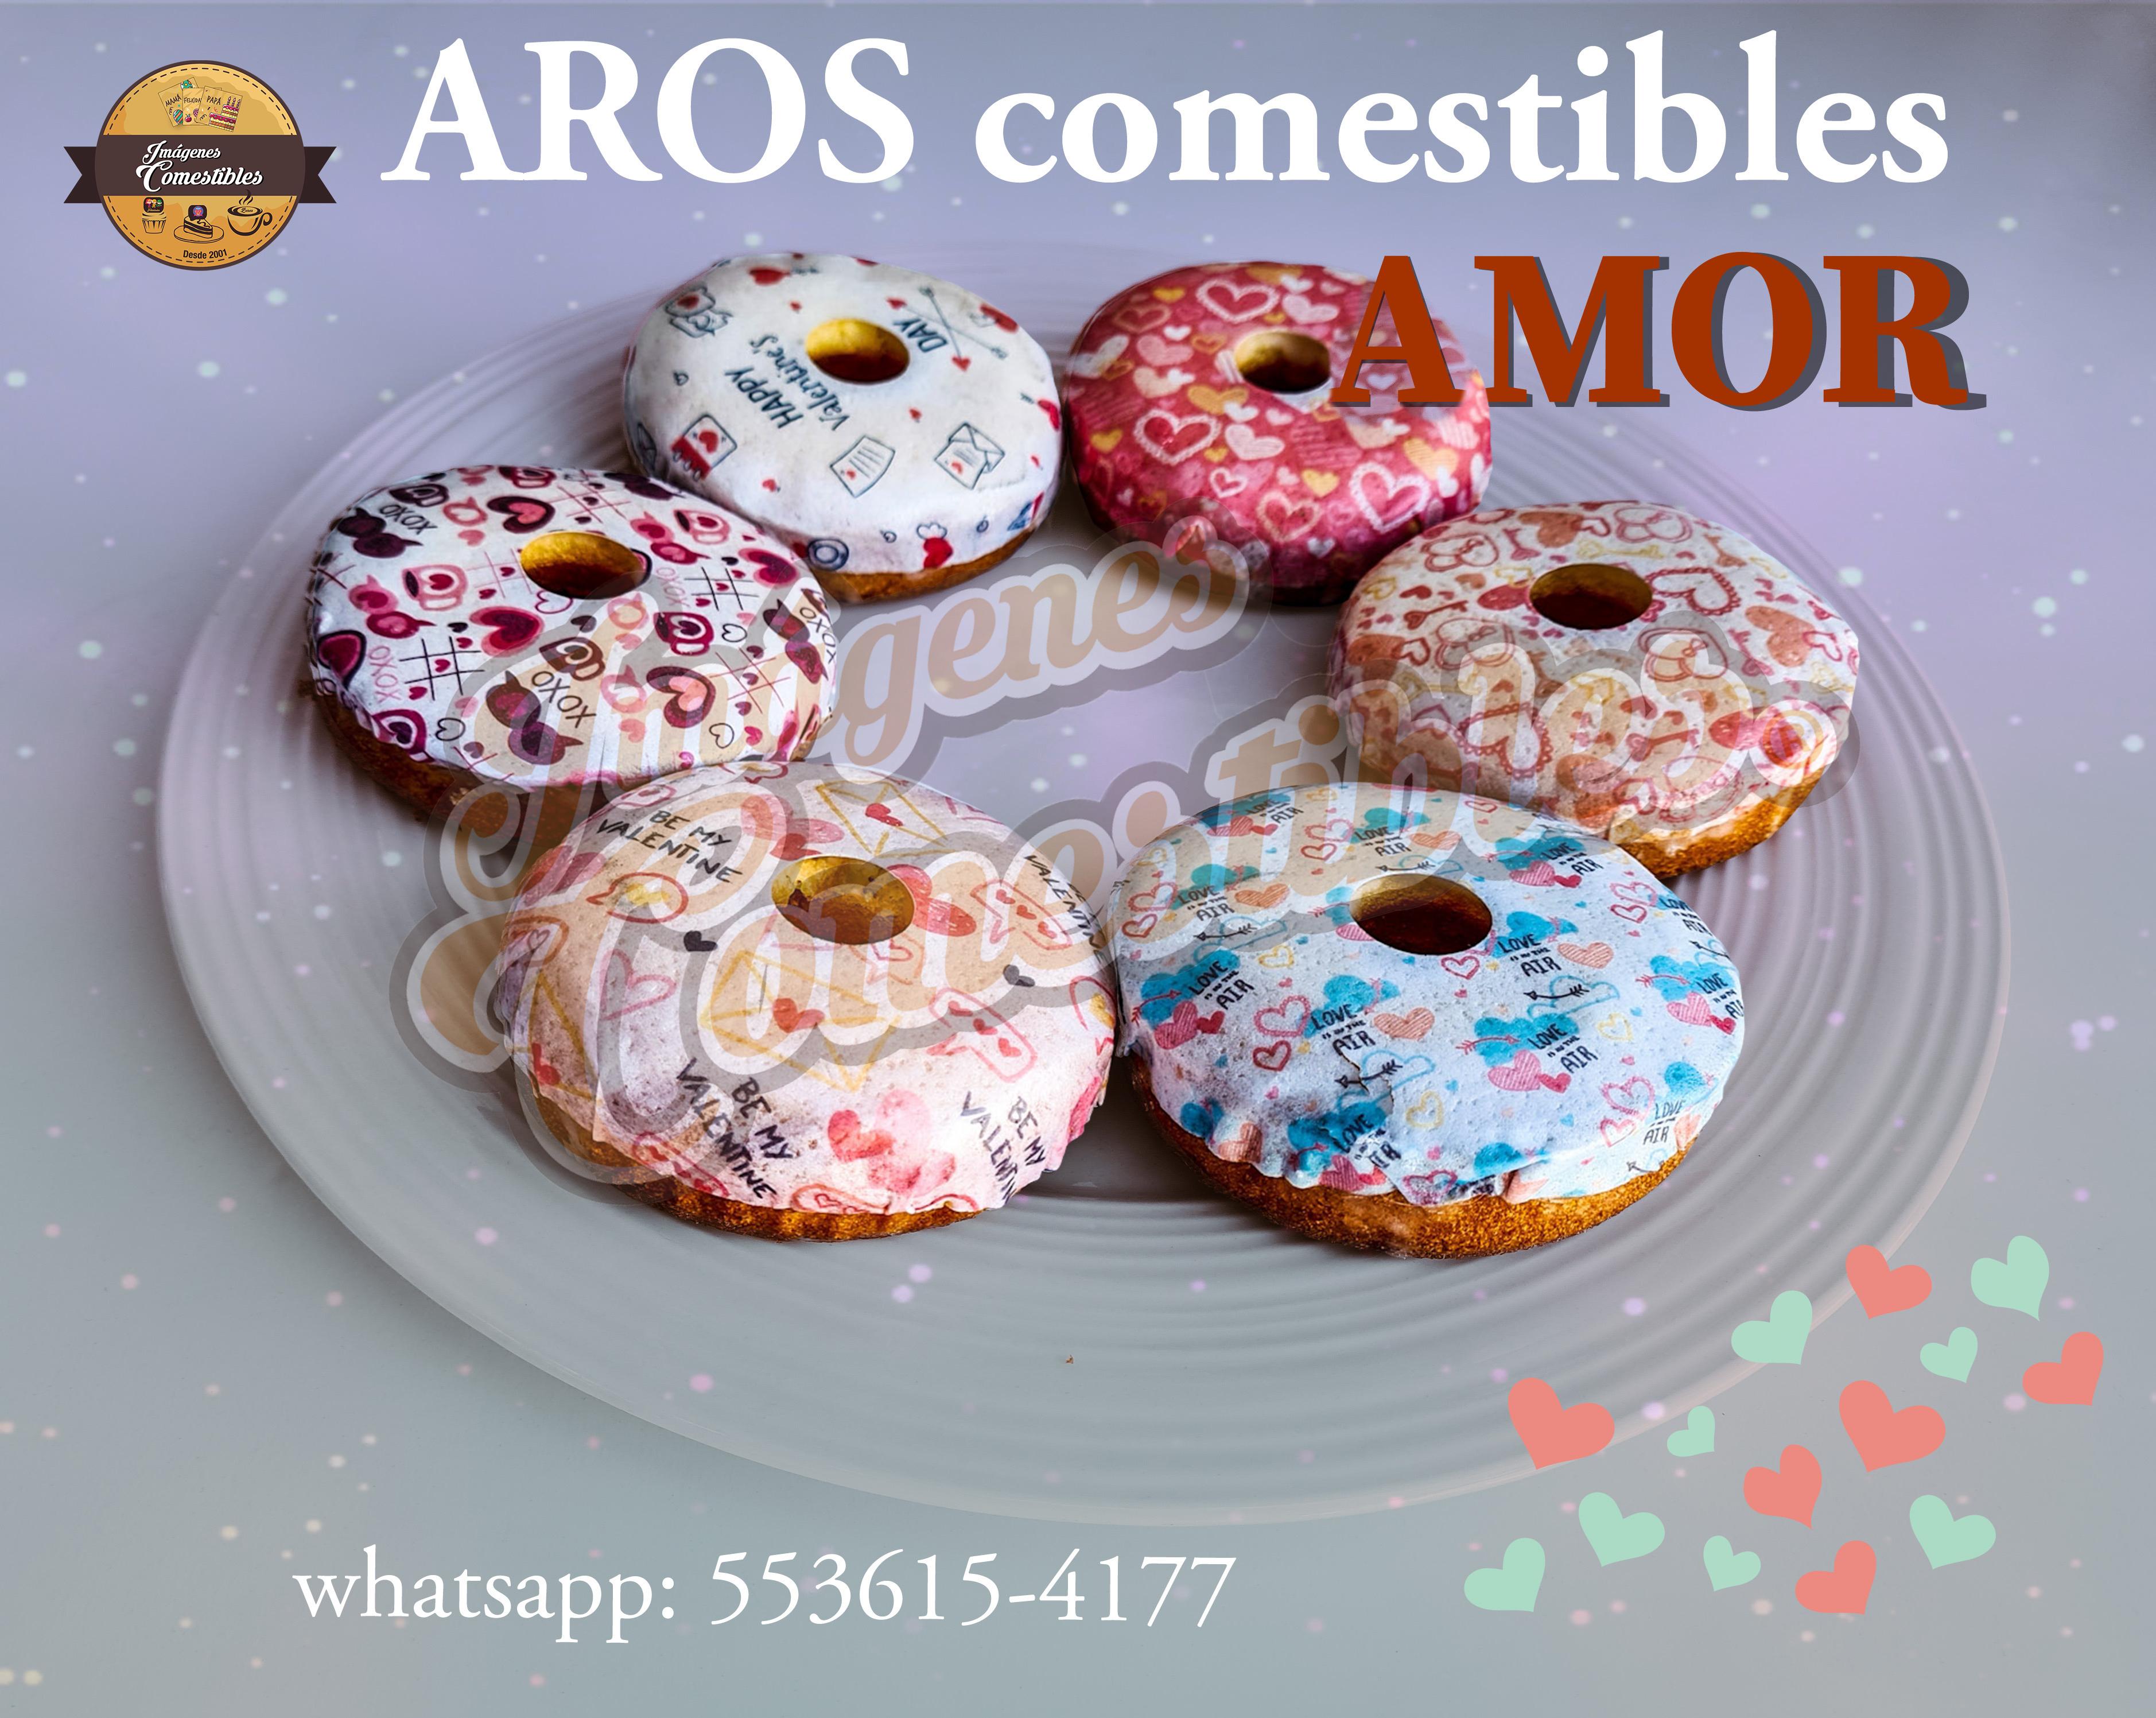 https://0201.nccdn.net/1_2/000/000/09c/f41/aros-comestibles-amor-en-donas.jpg